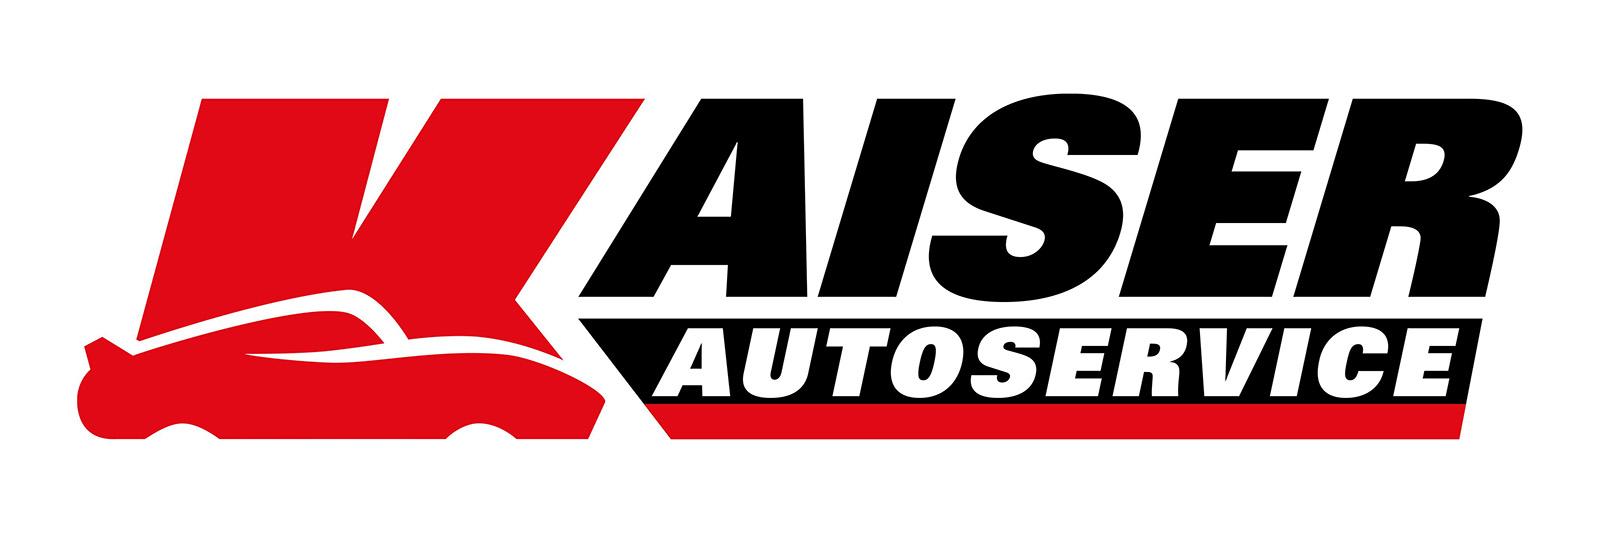 Logoentwicklung Autoservice Kaiser Leipzig